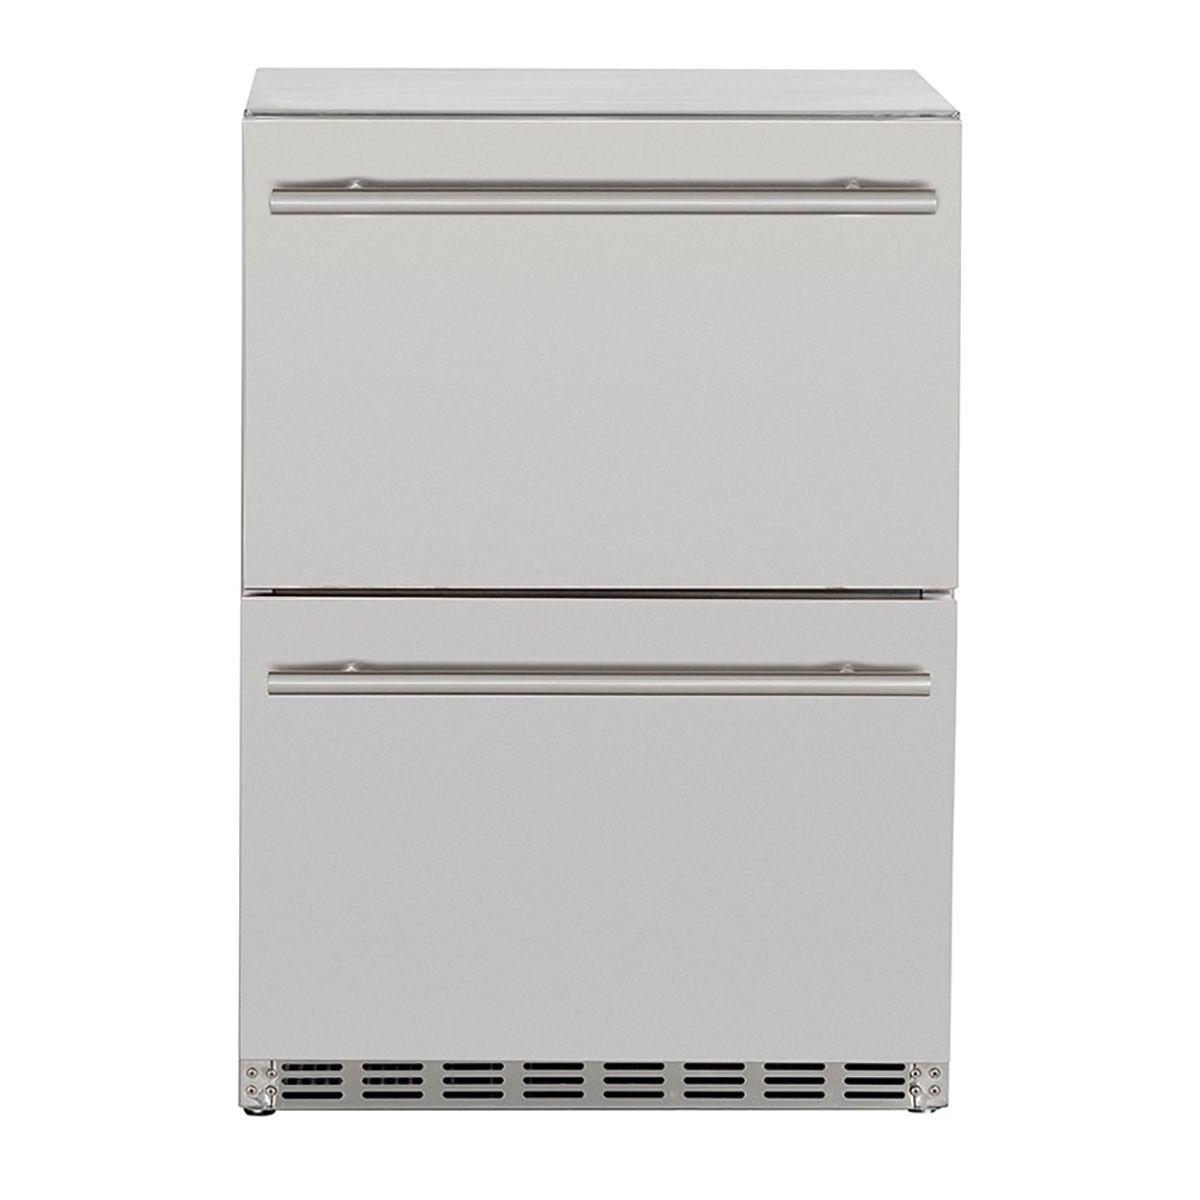 Summerset 24 5 3c Deluxe Outdoor Rated 2 Drawer Refrigerator In 2020 Refrigerator Drawers Refrigerator Drawers